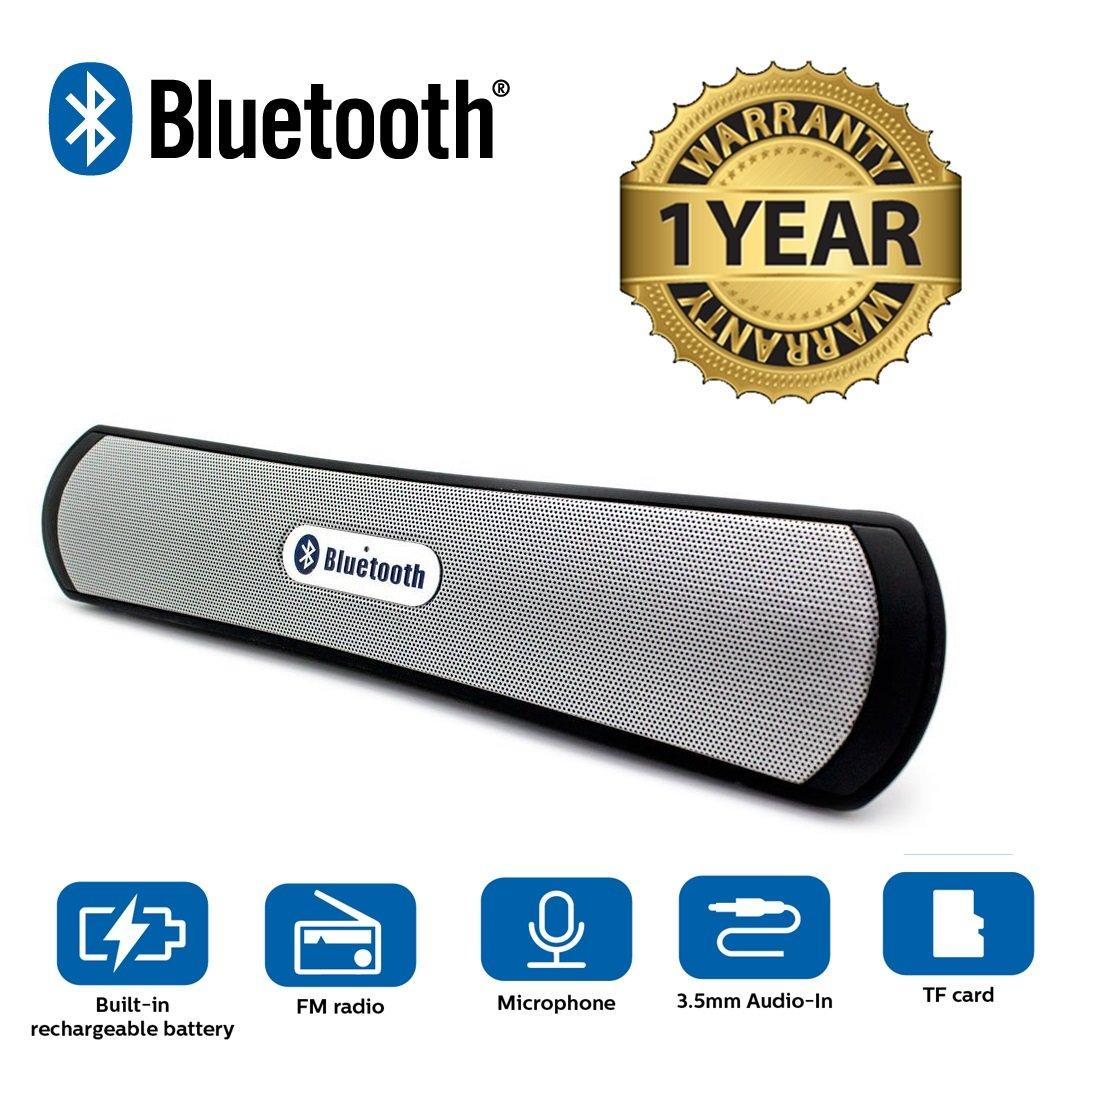 714EocE8ONL. SL1100  - Best Speakers Under 1000 in India - Mobiles, Laptops & Computers